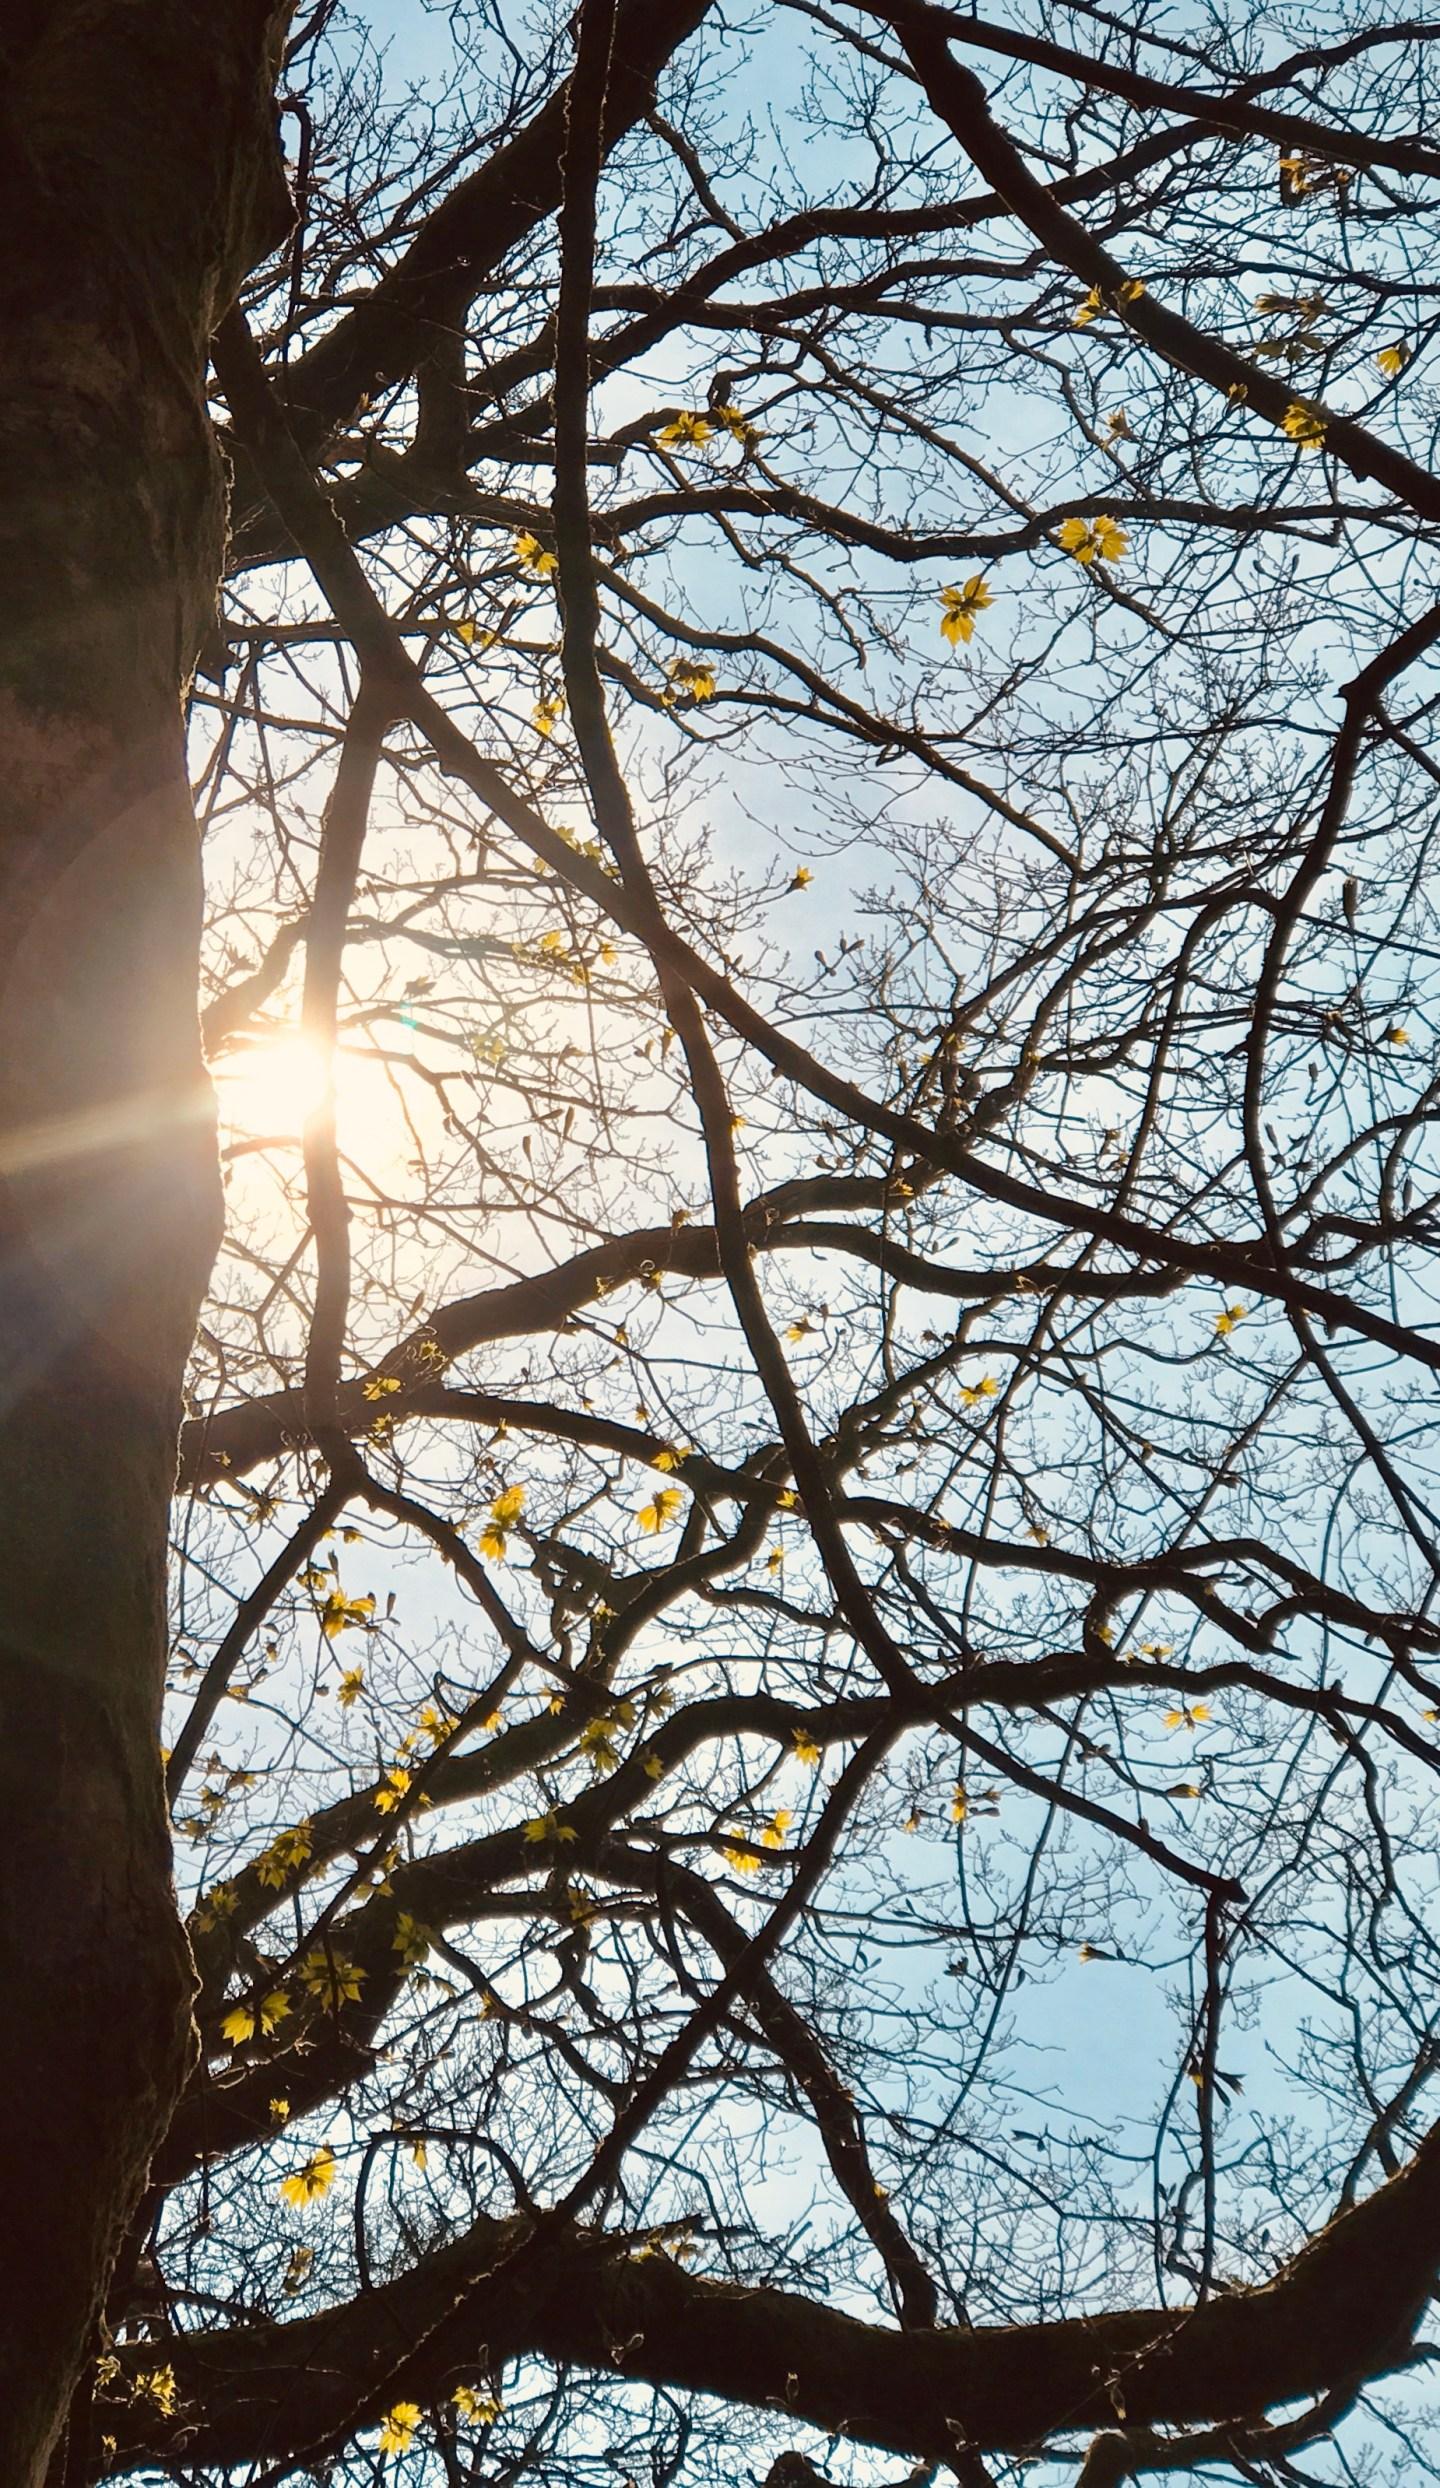 #MySundaySnapshot – Sunbeams Through The Branches 18/52 (2019)